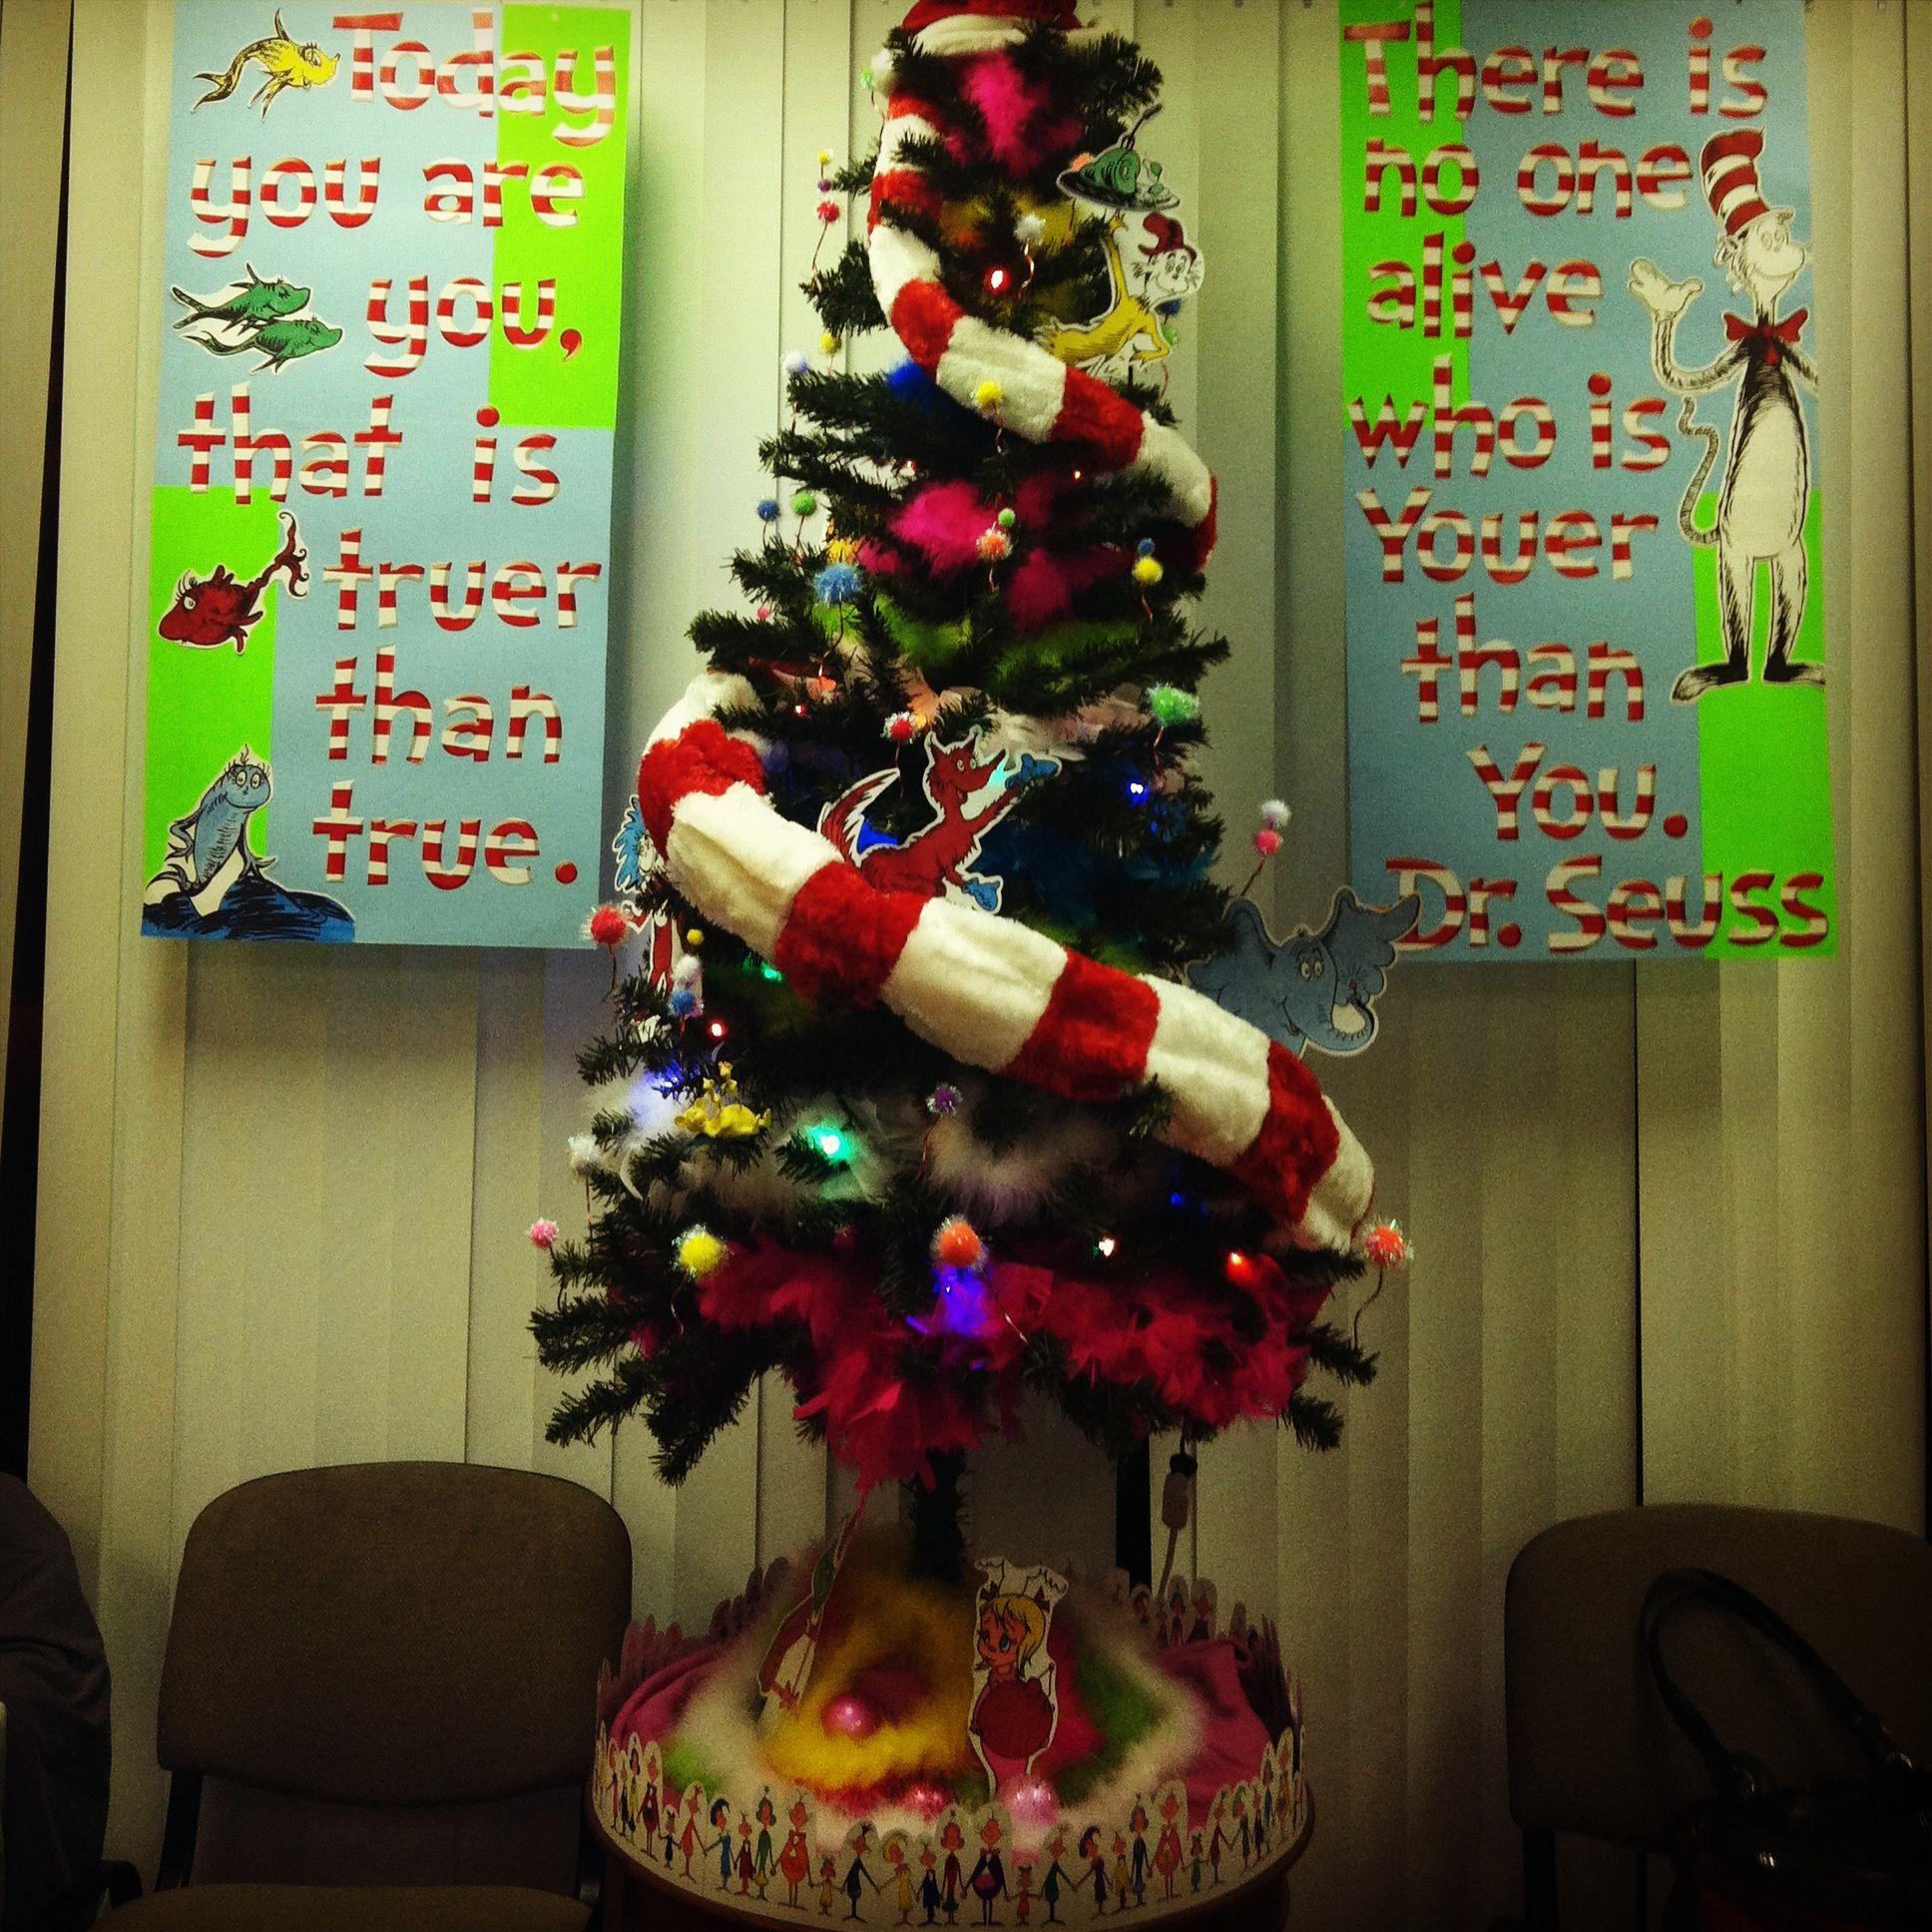 Dr seuss themed christmas tree wishing you a very merry christmas